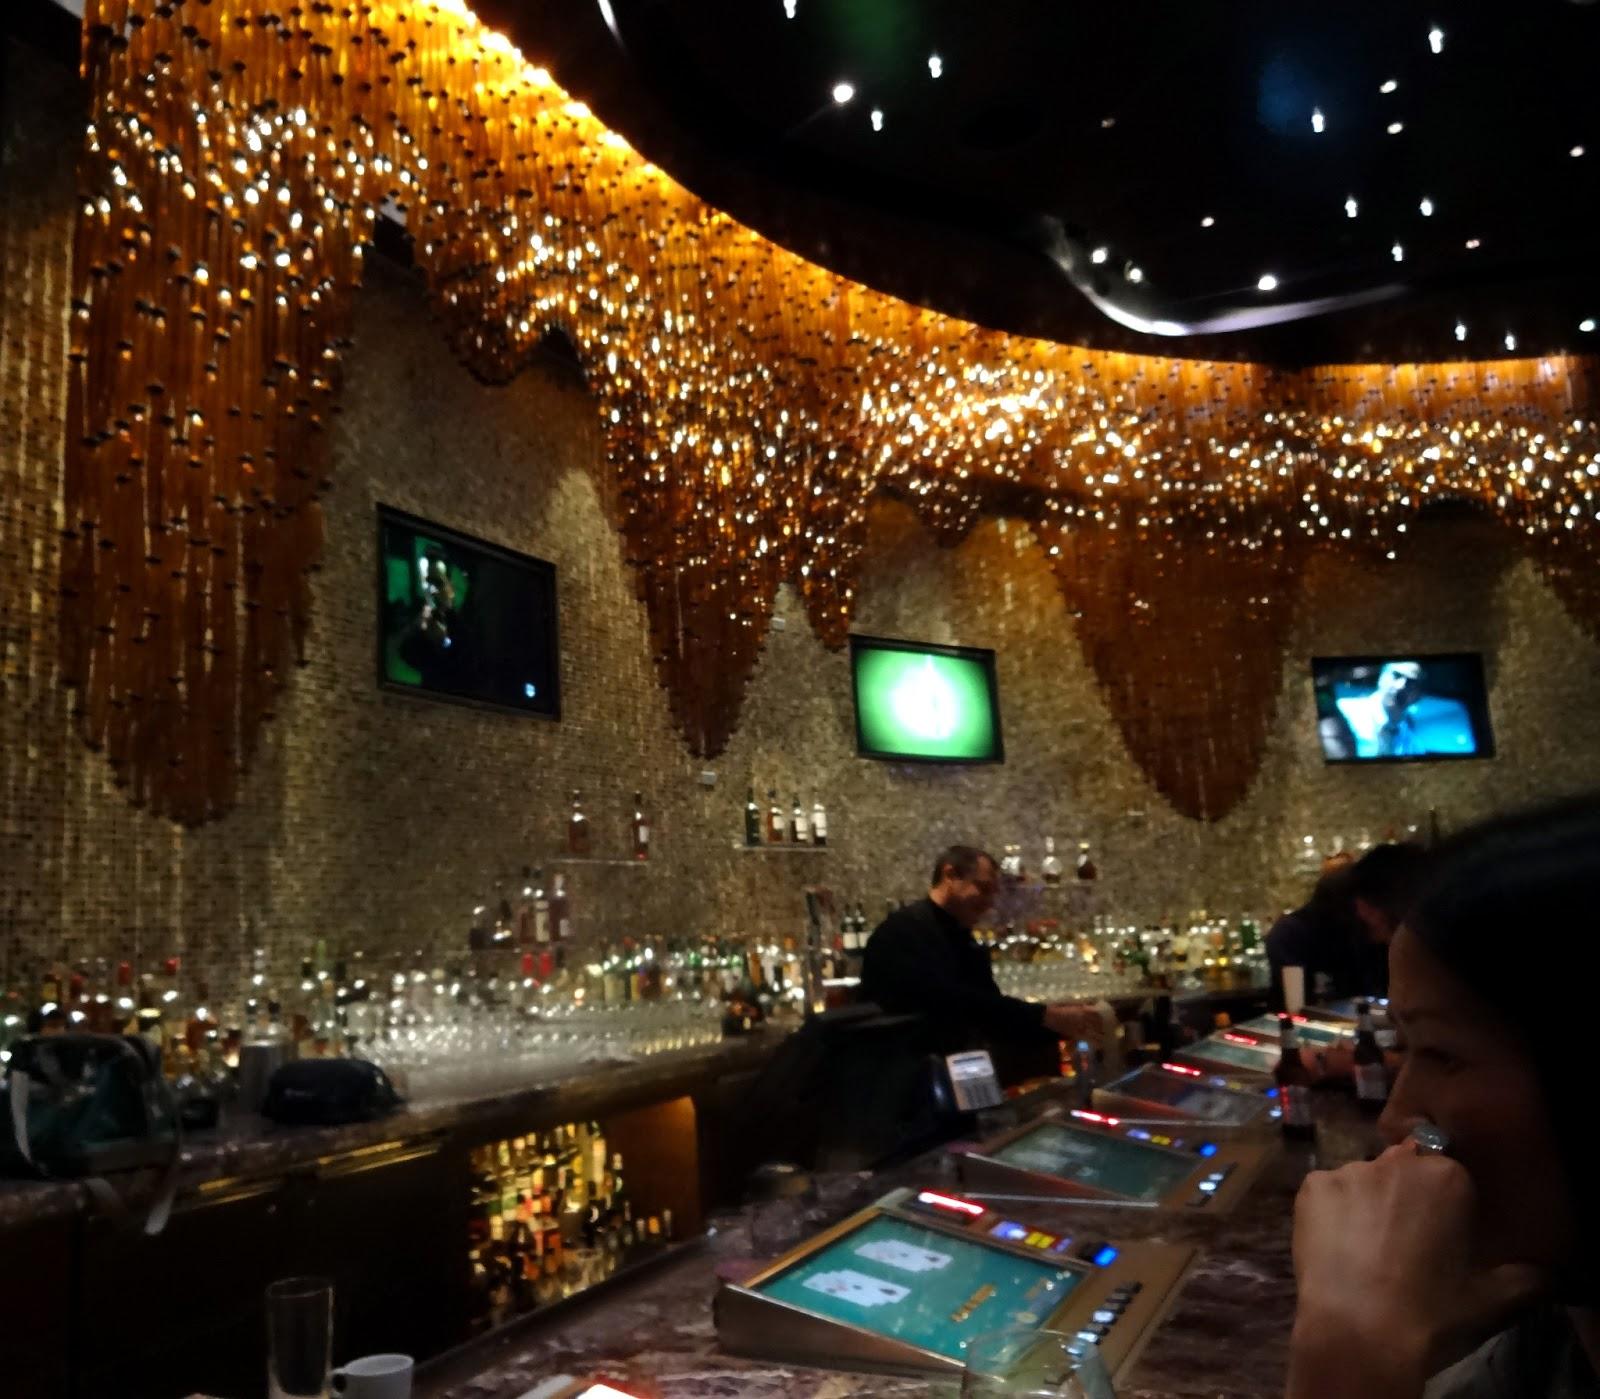 3730 las vegas -  1937 Bar Moderno Aria Las Vegas 10 13 2012